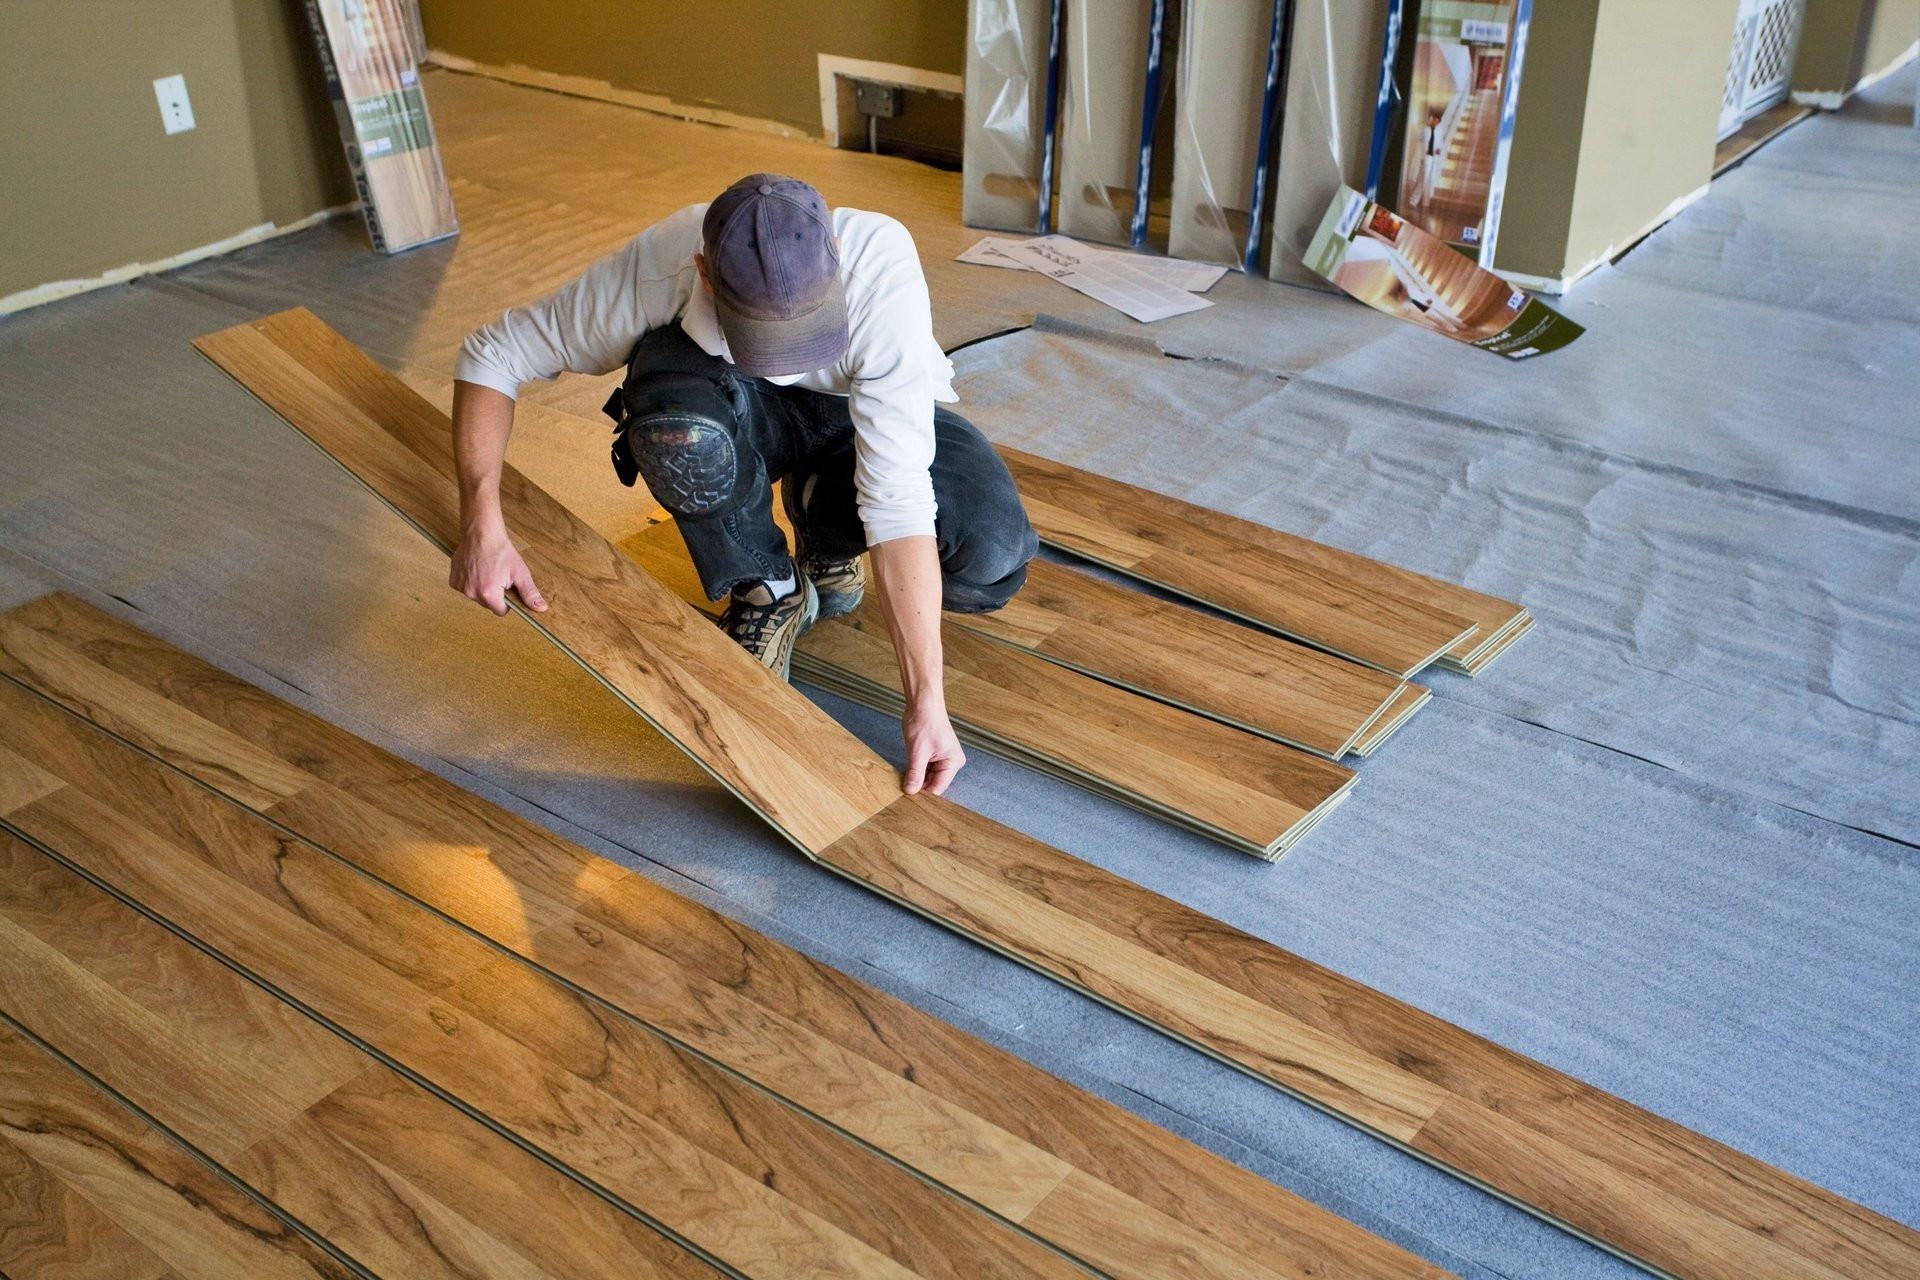 Laying Hardwood Floors In Different Directions Of American Floor Service Hardwood Flooring Fairfield Ct Inside Hardwood Flooring